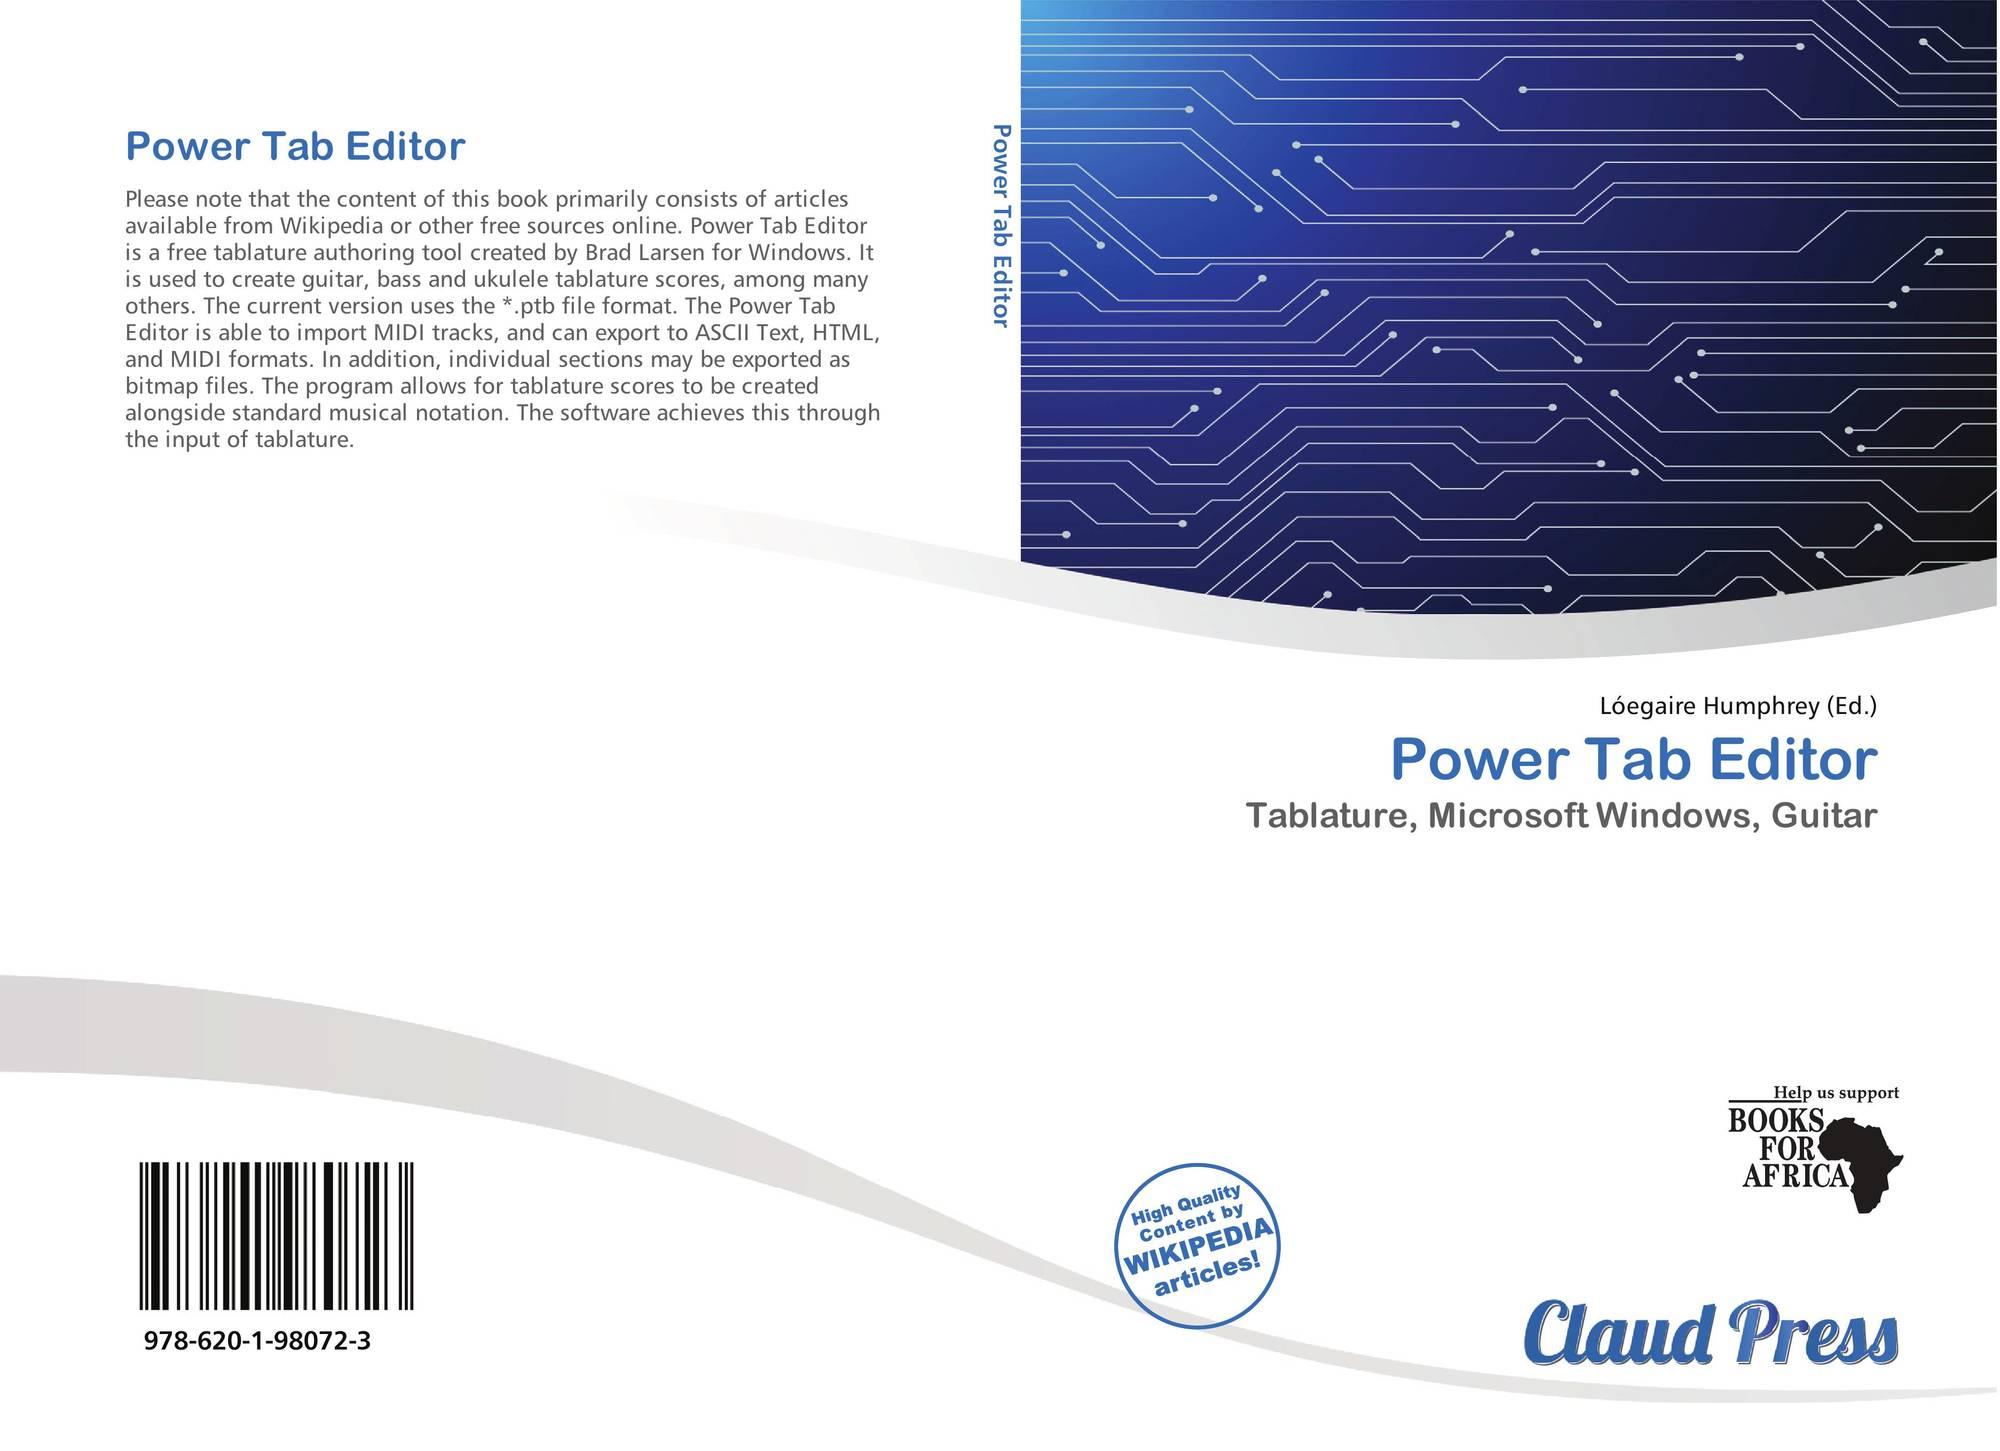 Power Tab Editor, 978-620-1-98072-3, 6201980725 ,9786201980723